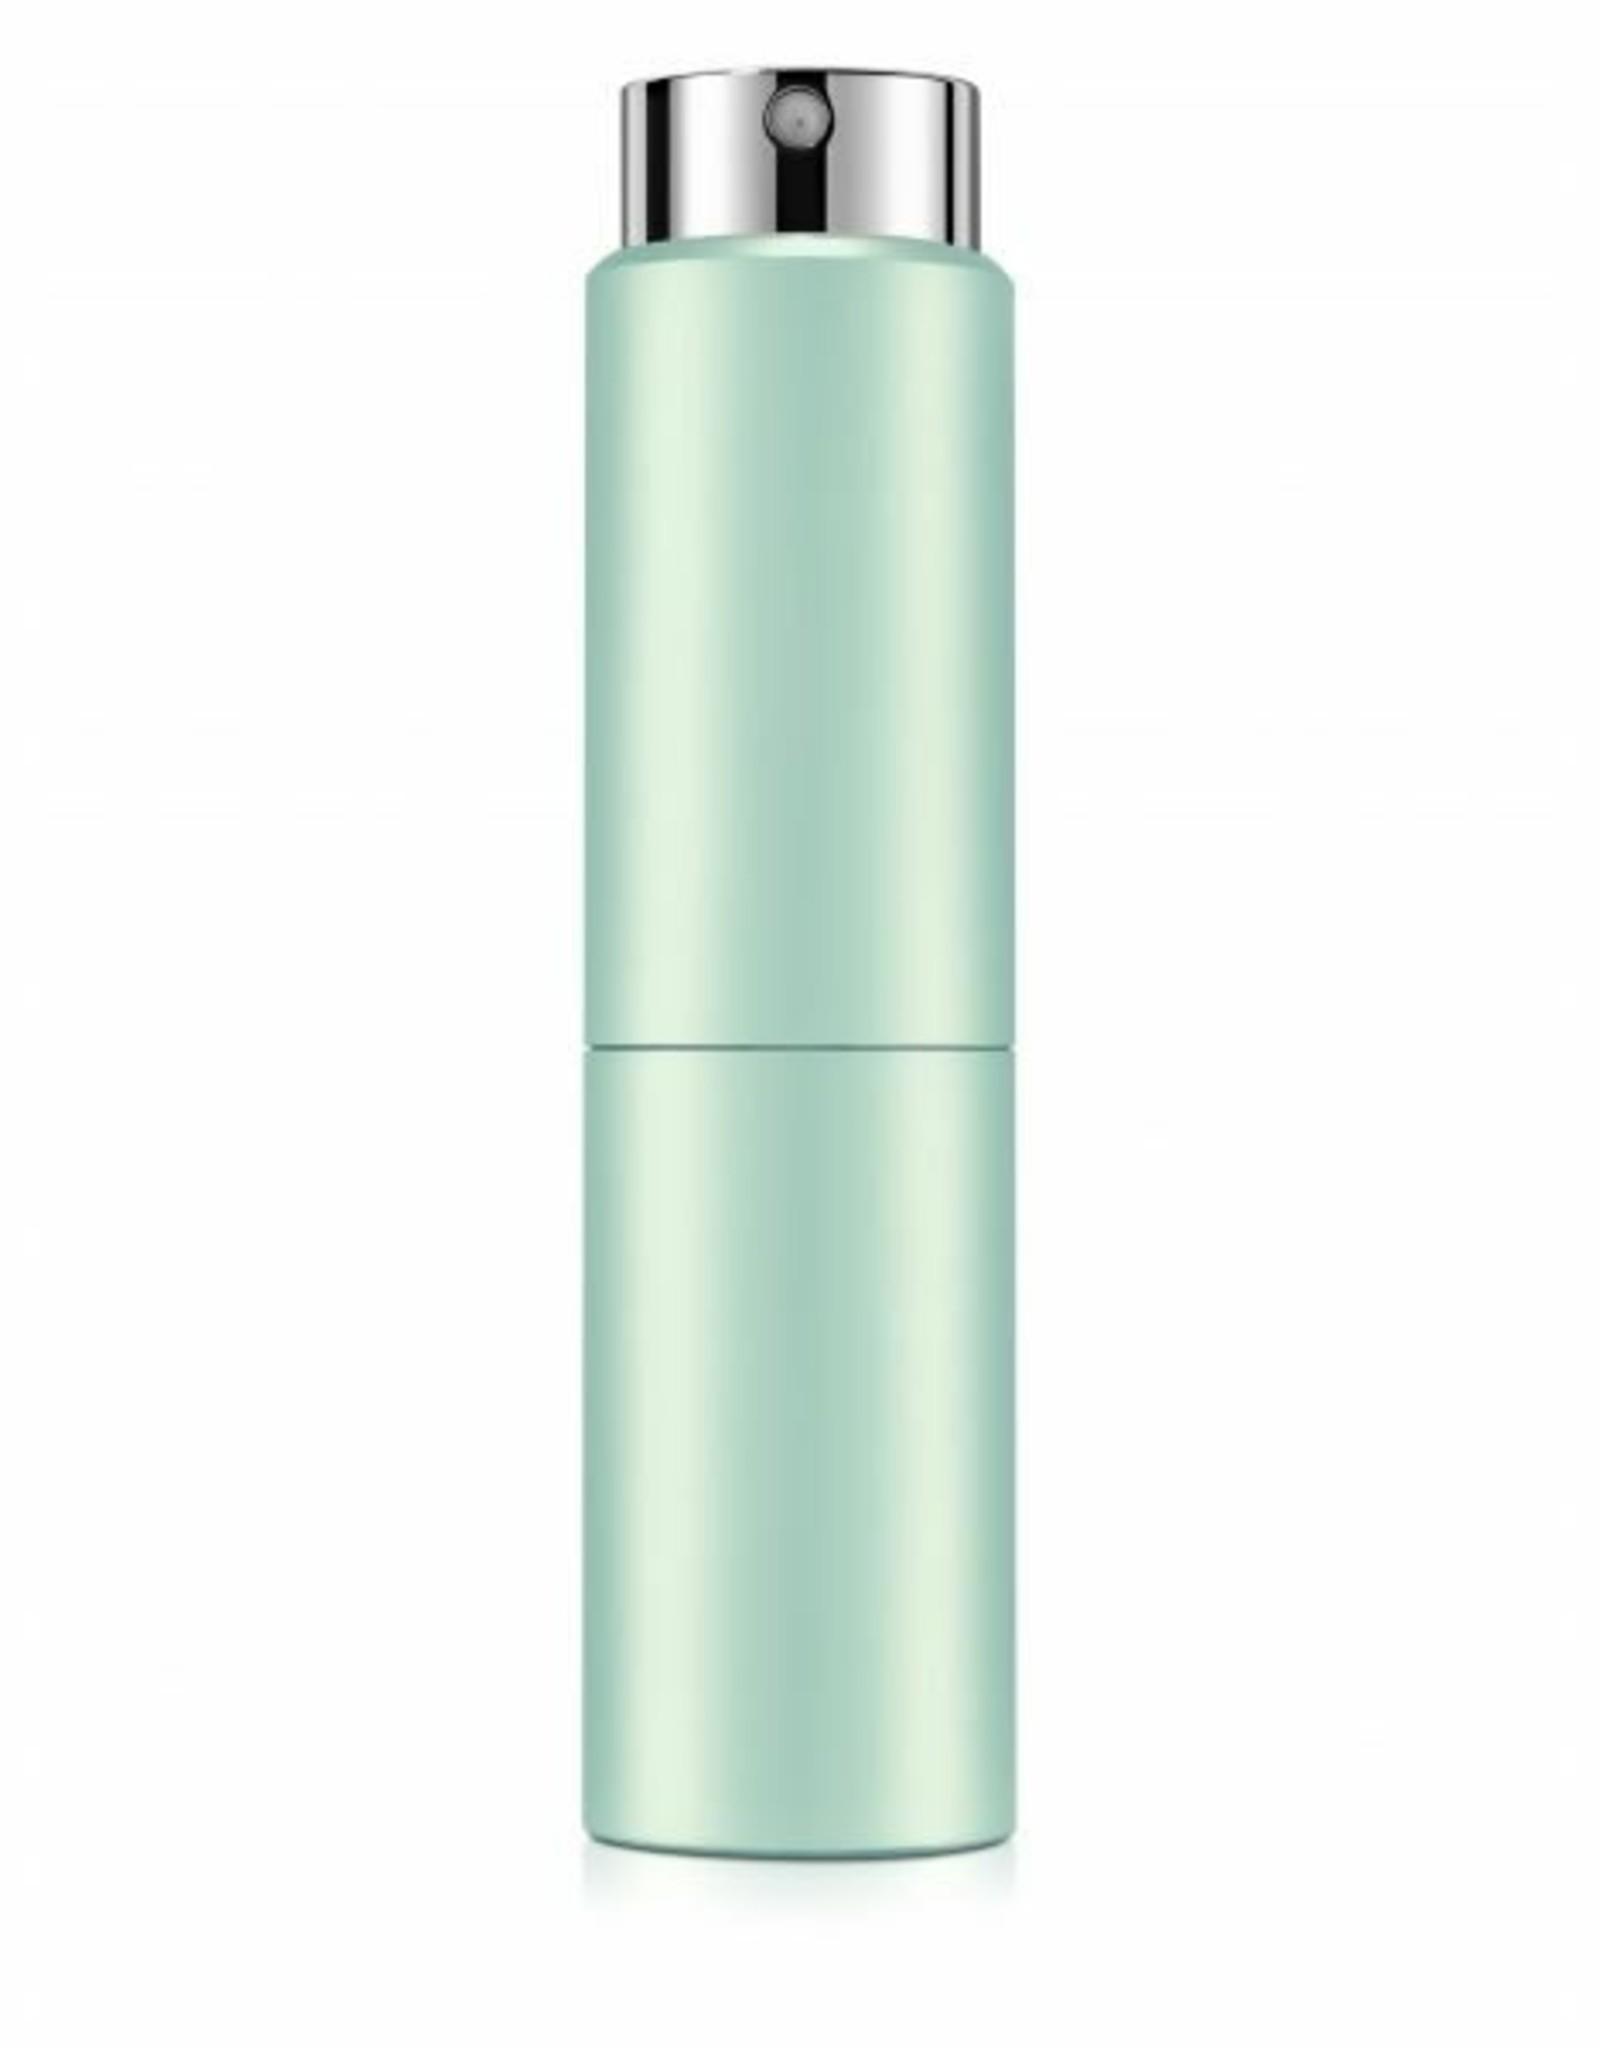 Equivalenza Vaporisateur de Parfum Menthe - 15ml